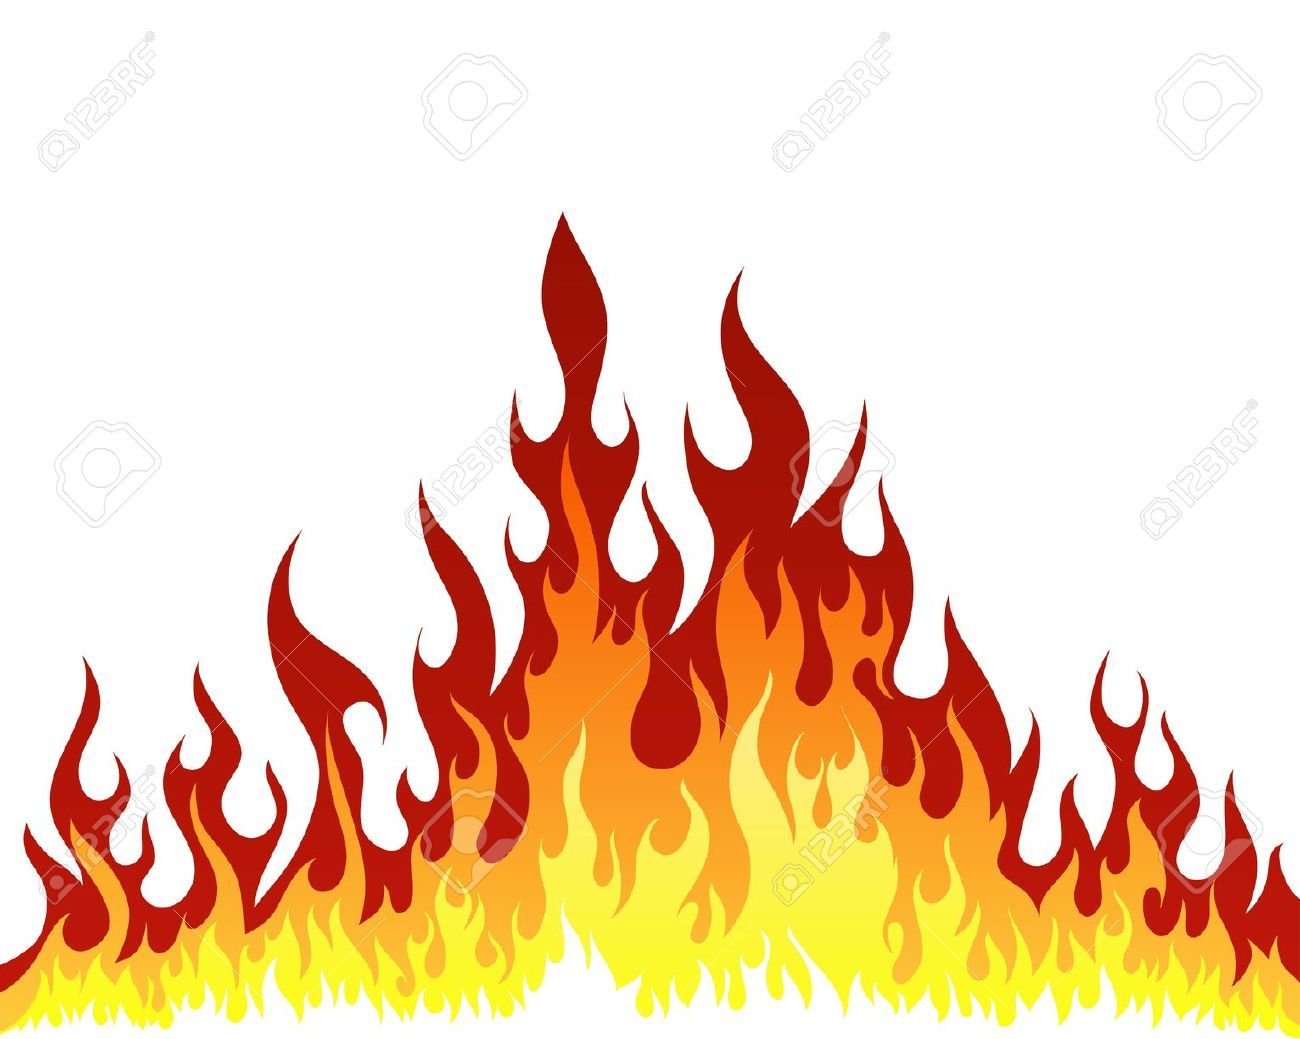 Fire Flames Designs <b>fire flame designs</b>.